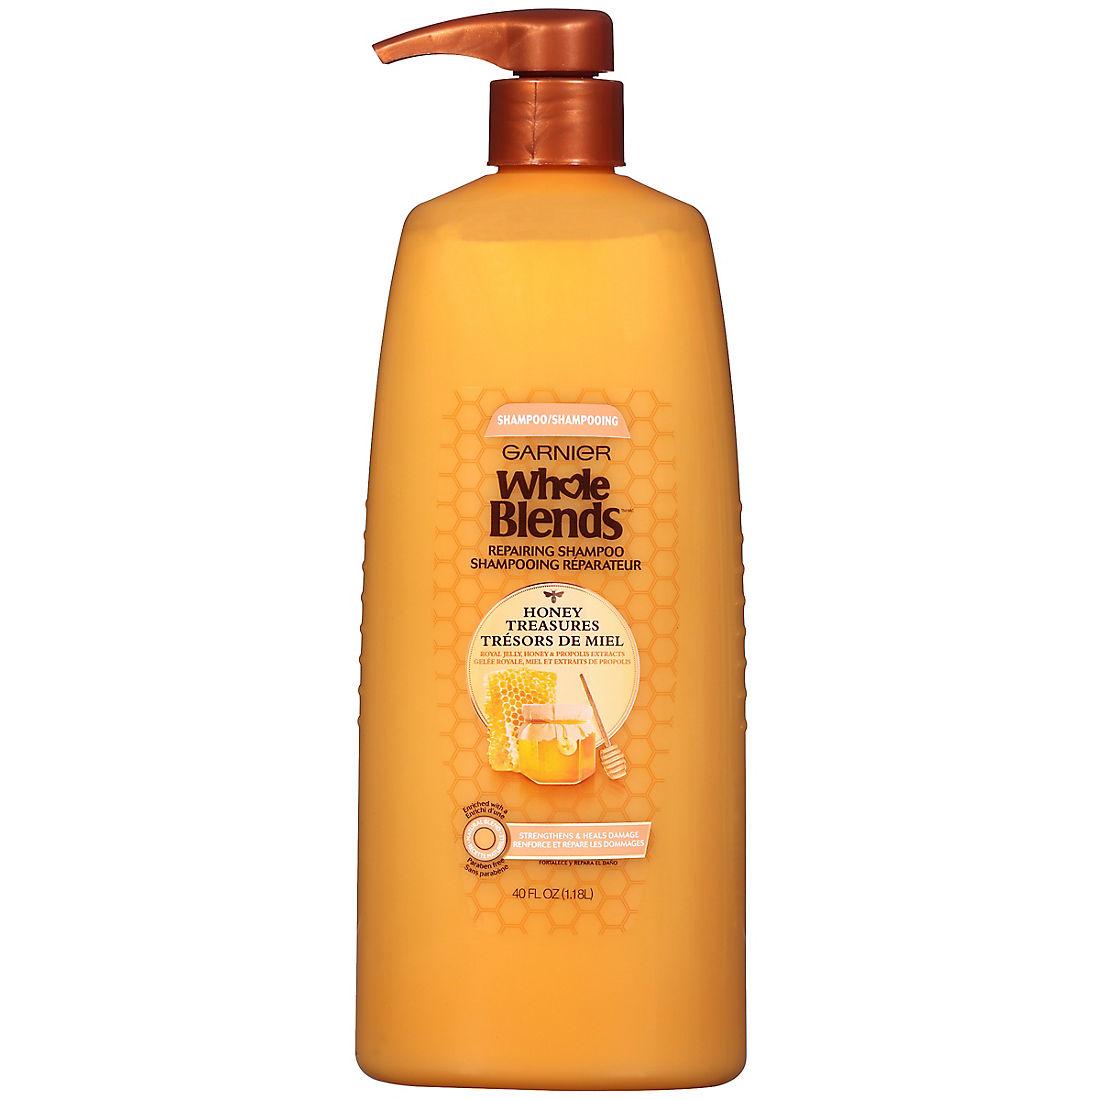 image relating to Garnier Whole Blends Printable Coupon identify Garnier Entire Blends Honey Treasures Correcting Shampoo, 40 fl. oz.